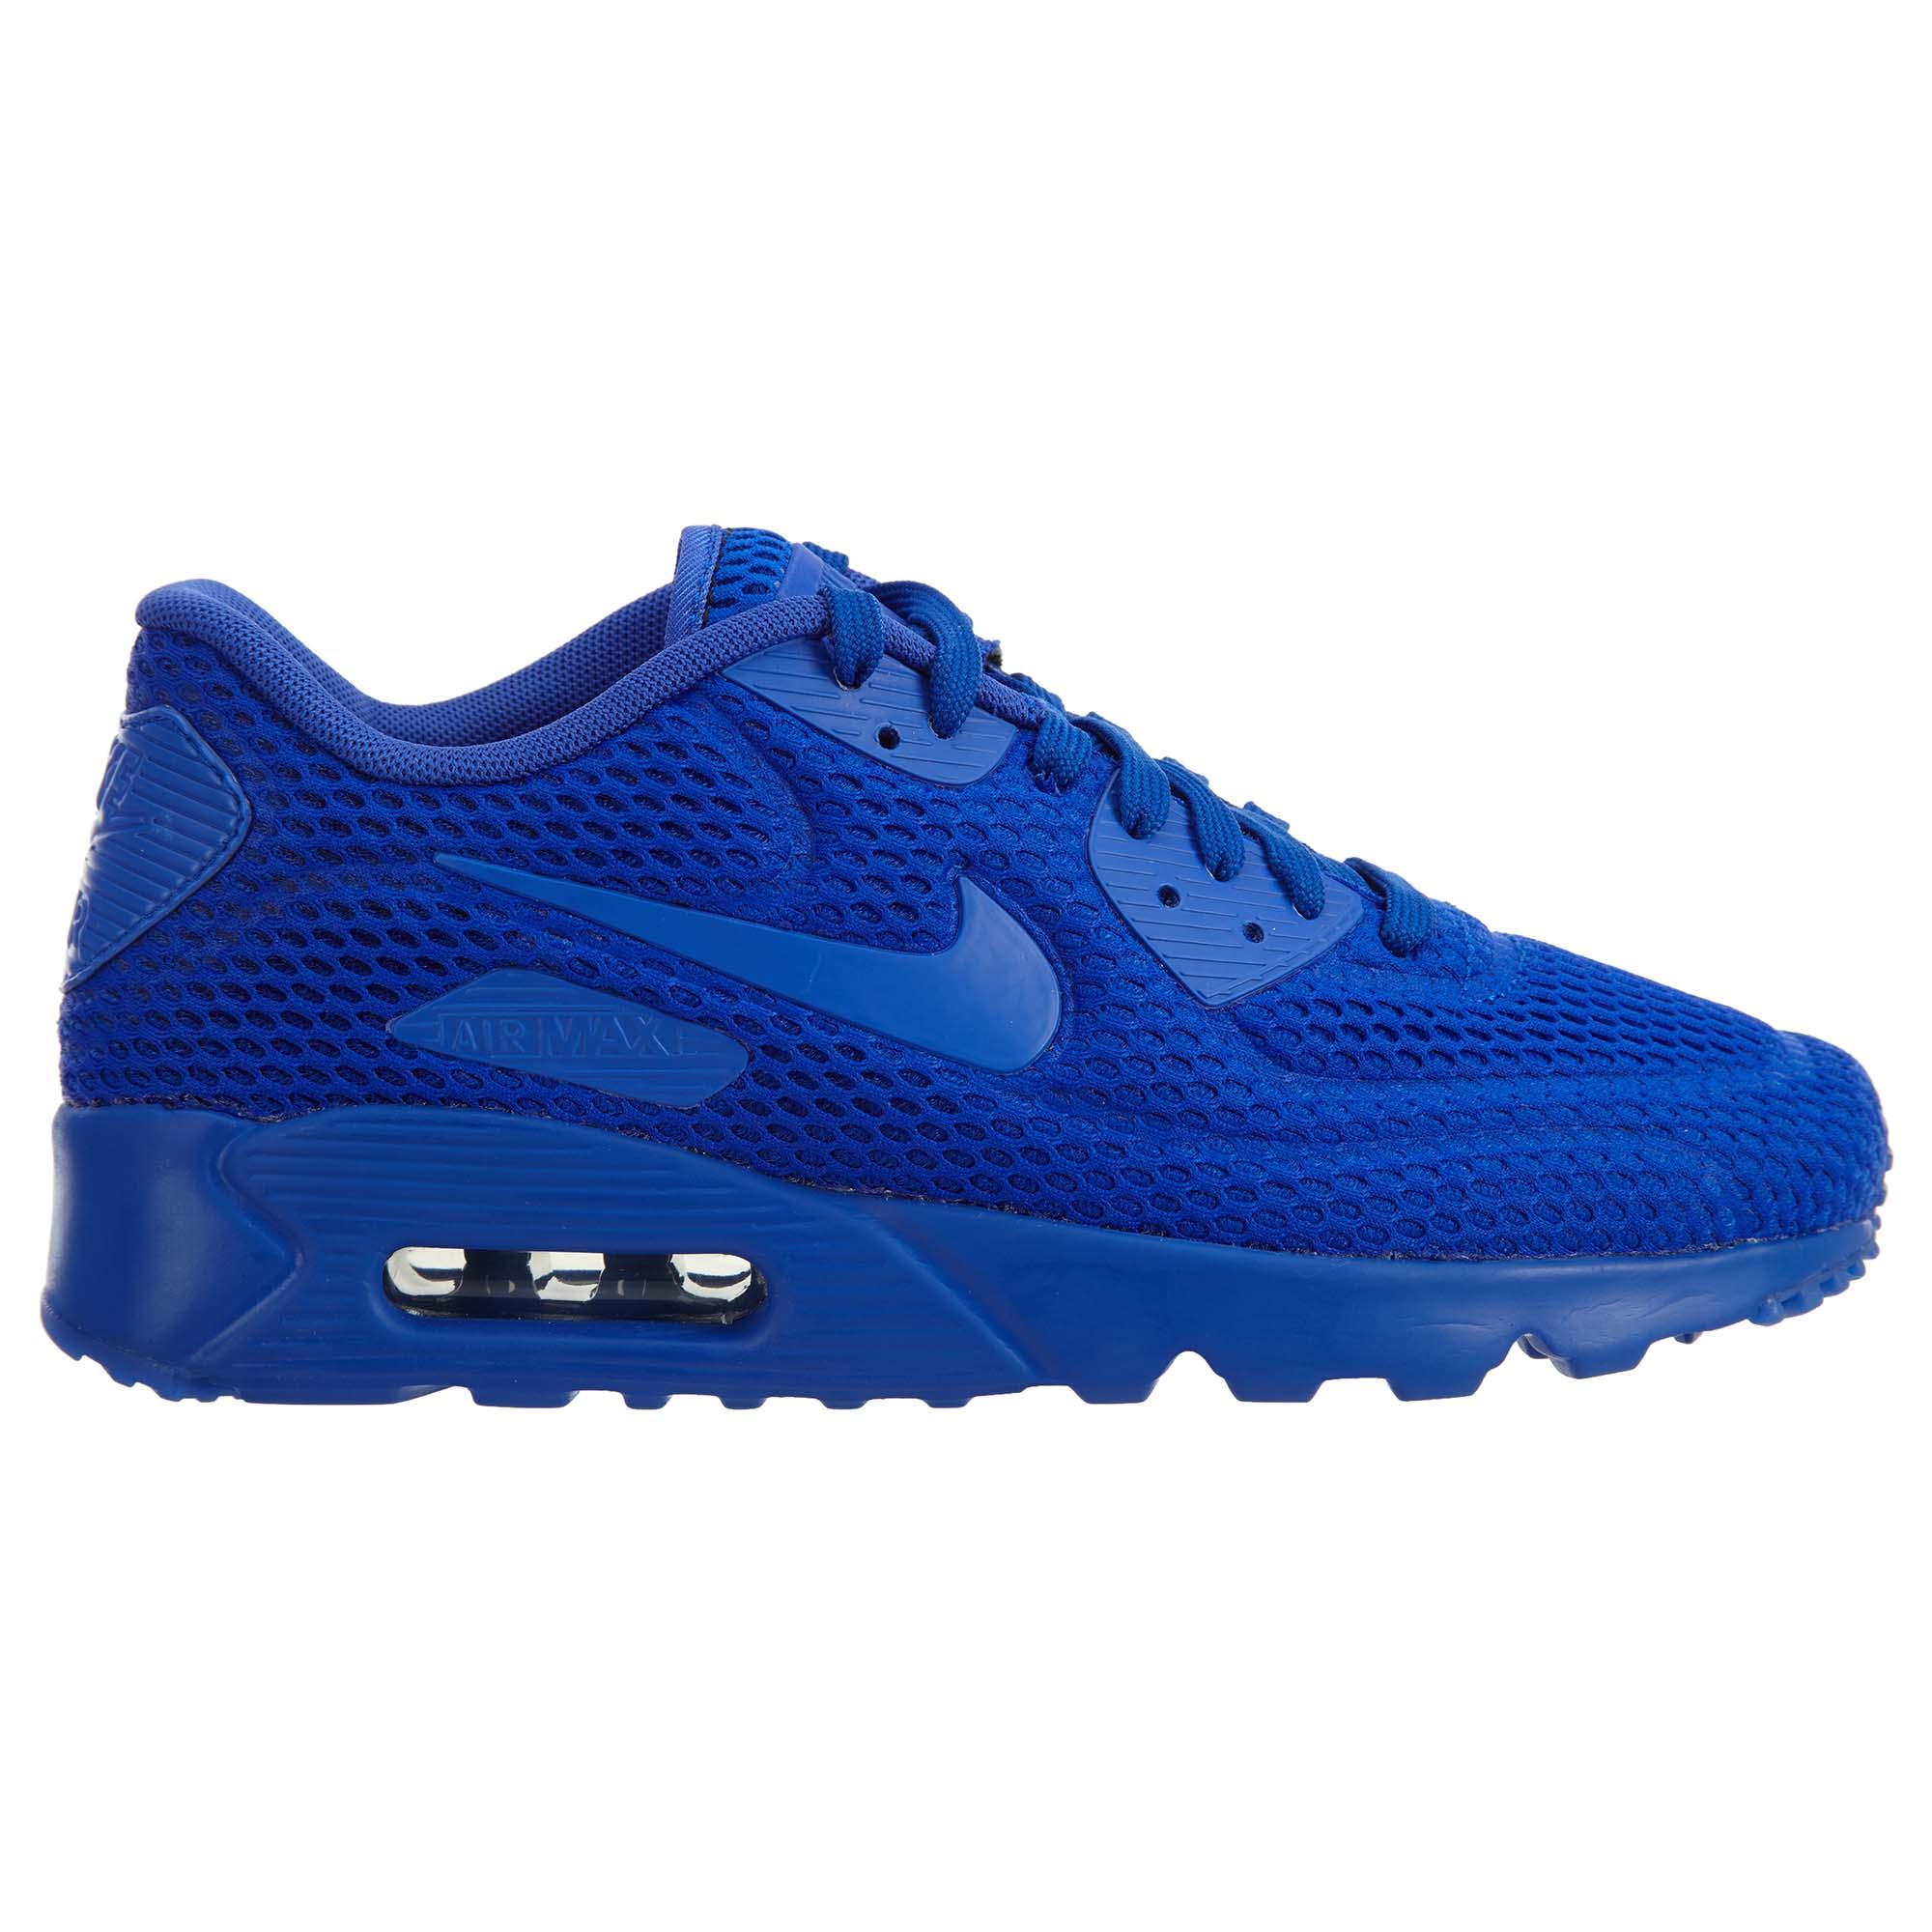 Nike Air Max 90 Ultra Br Racer Blue/Racer Blue - 725222-402